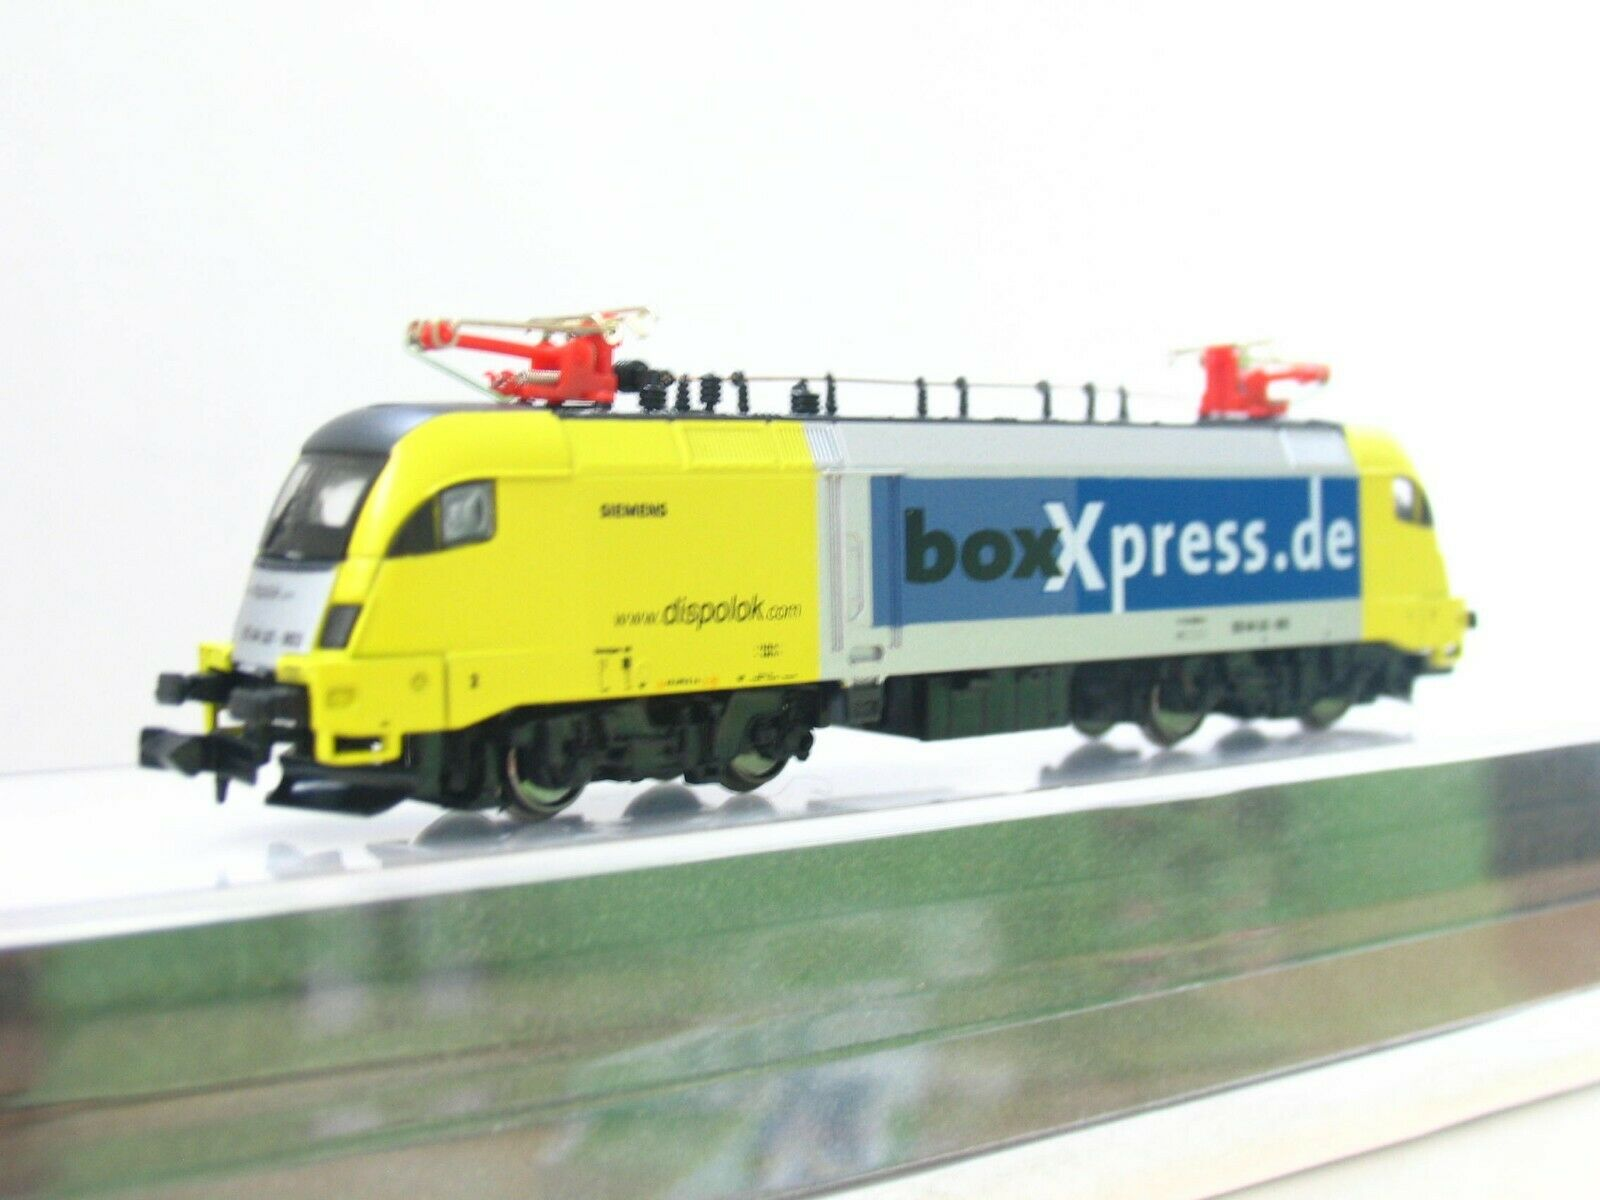 Hobbytrain 219675 E-Locomotive It 64 U2 - 903 Dispolok Boxpress  OVP (RB7962)